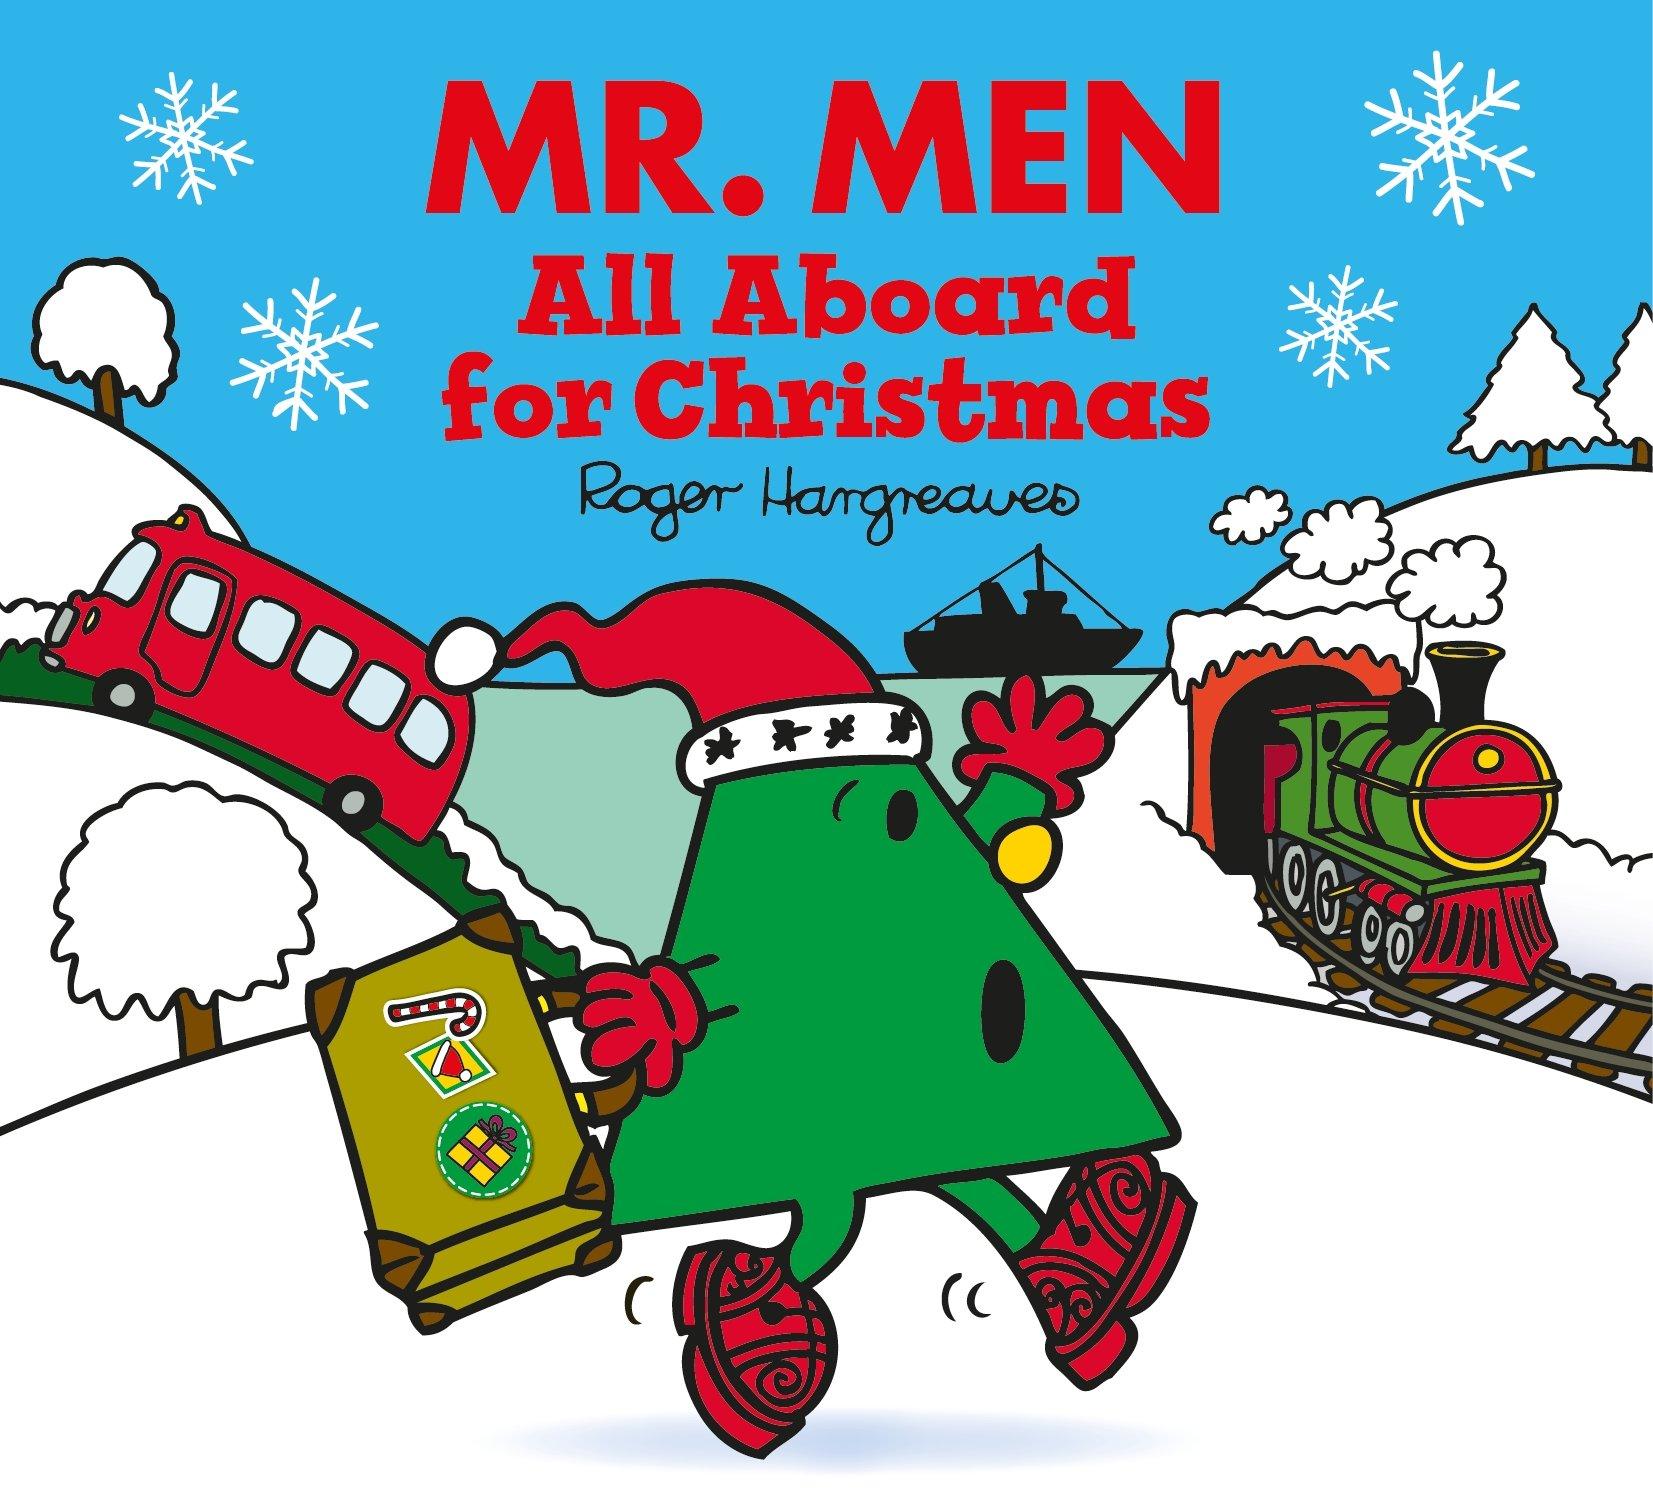 Mr. Men - All Aboard for Christmas